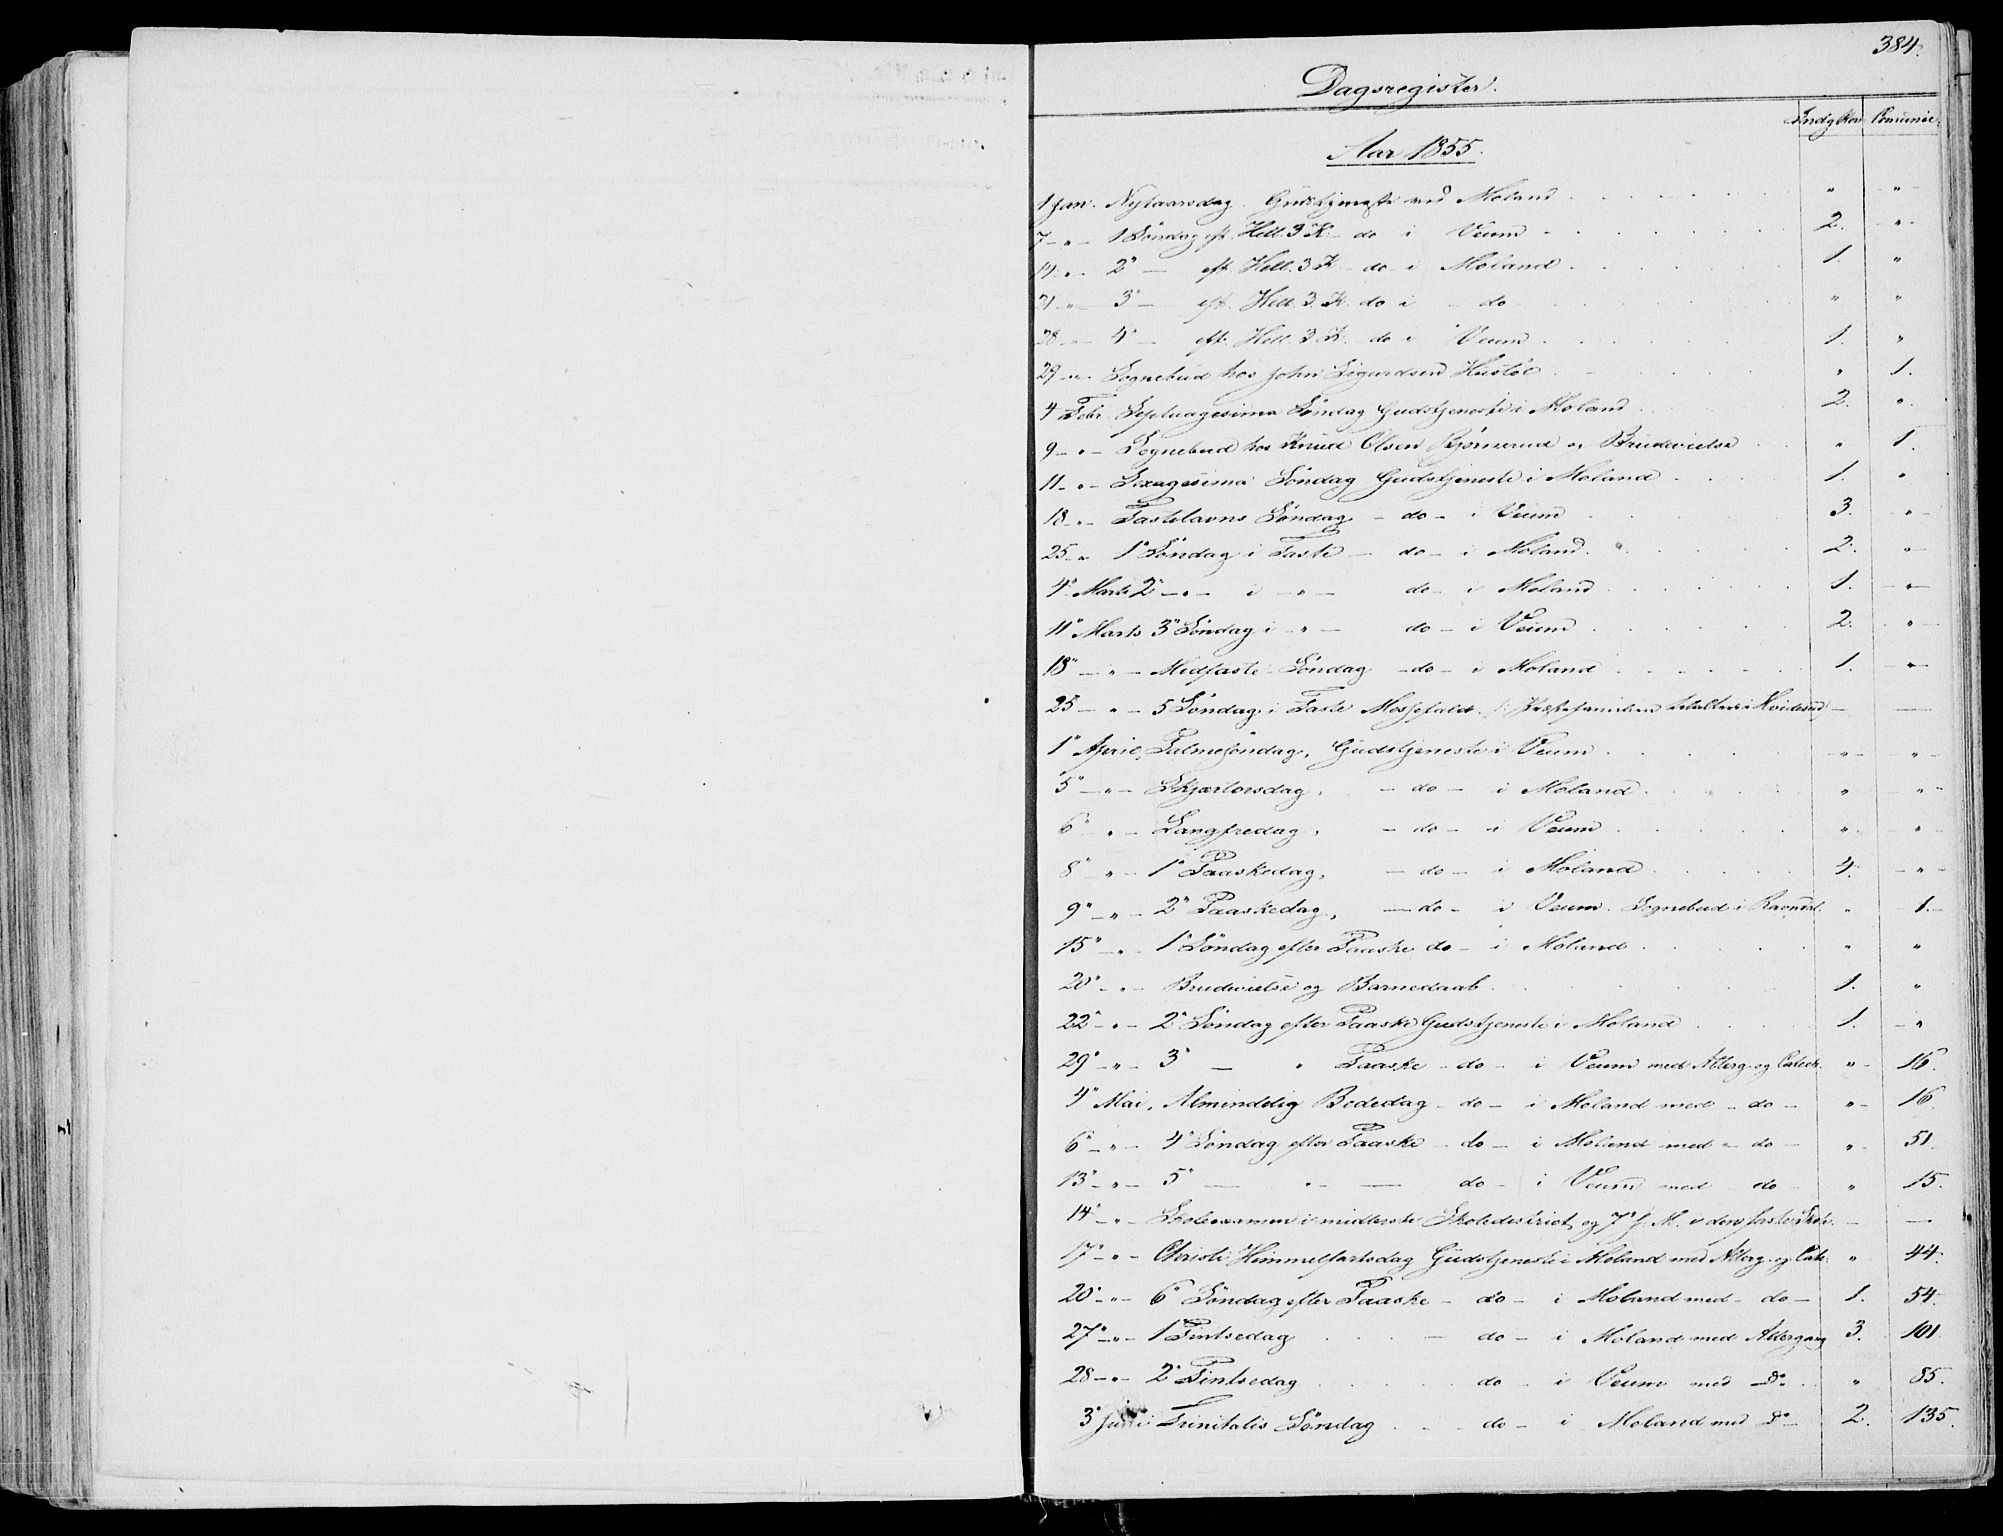 SAKO, Fyresdal kirkebøker, F/Fa/L0005: Parish register (official) no. I 5, 1855-1871, p. 384